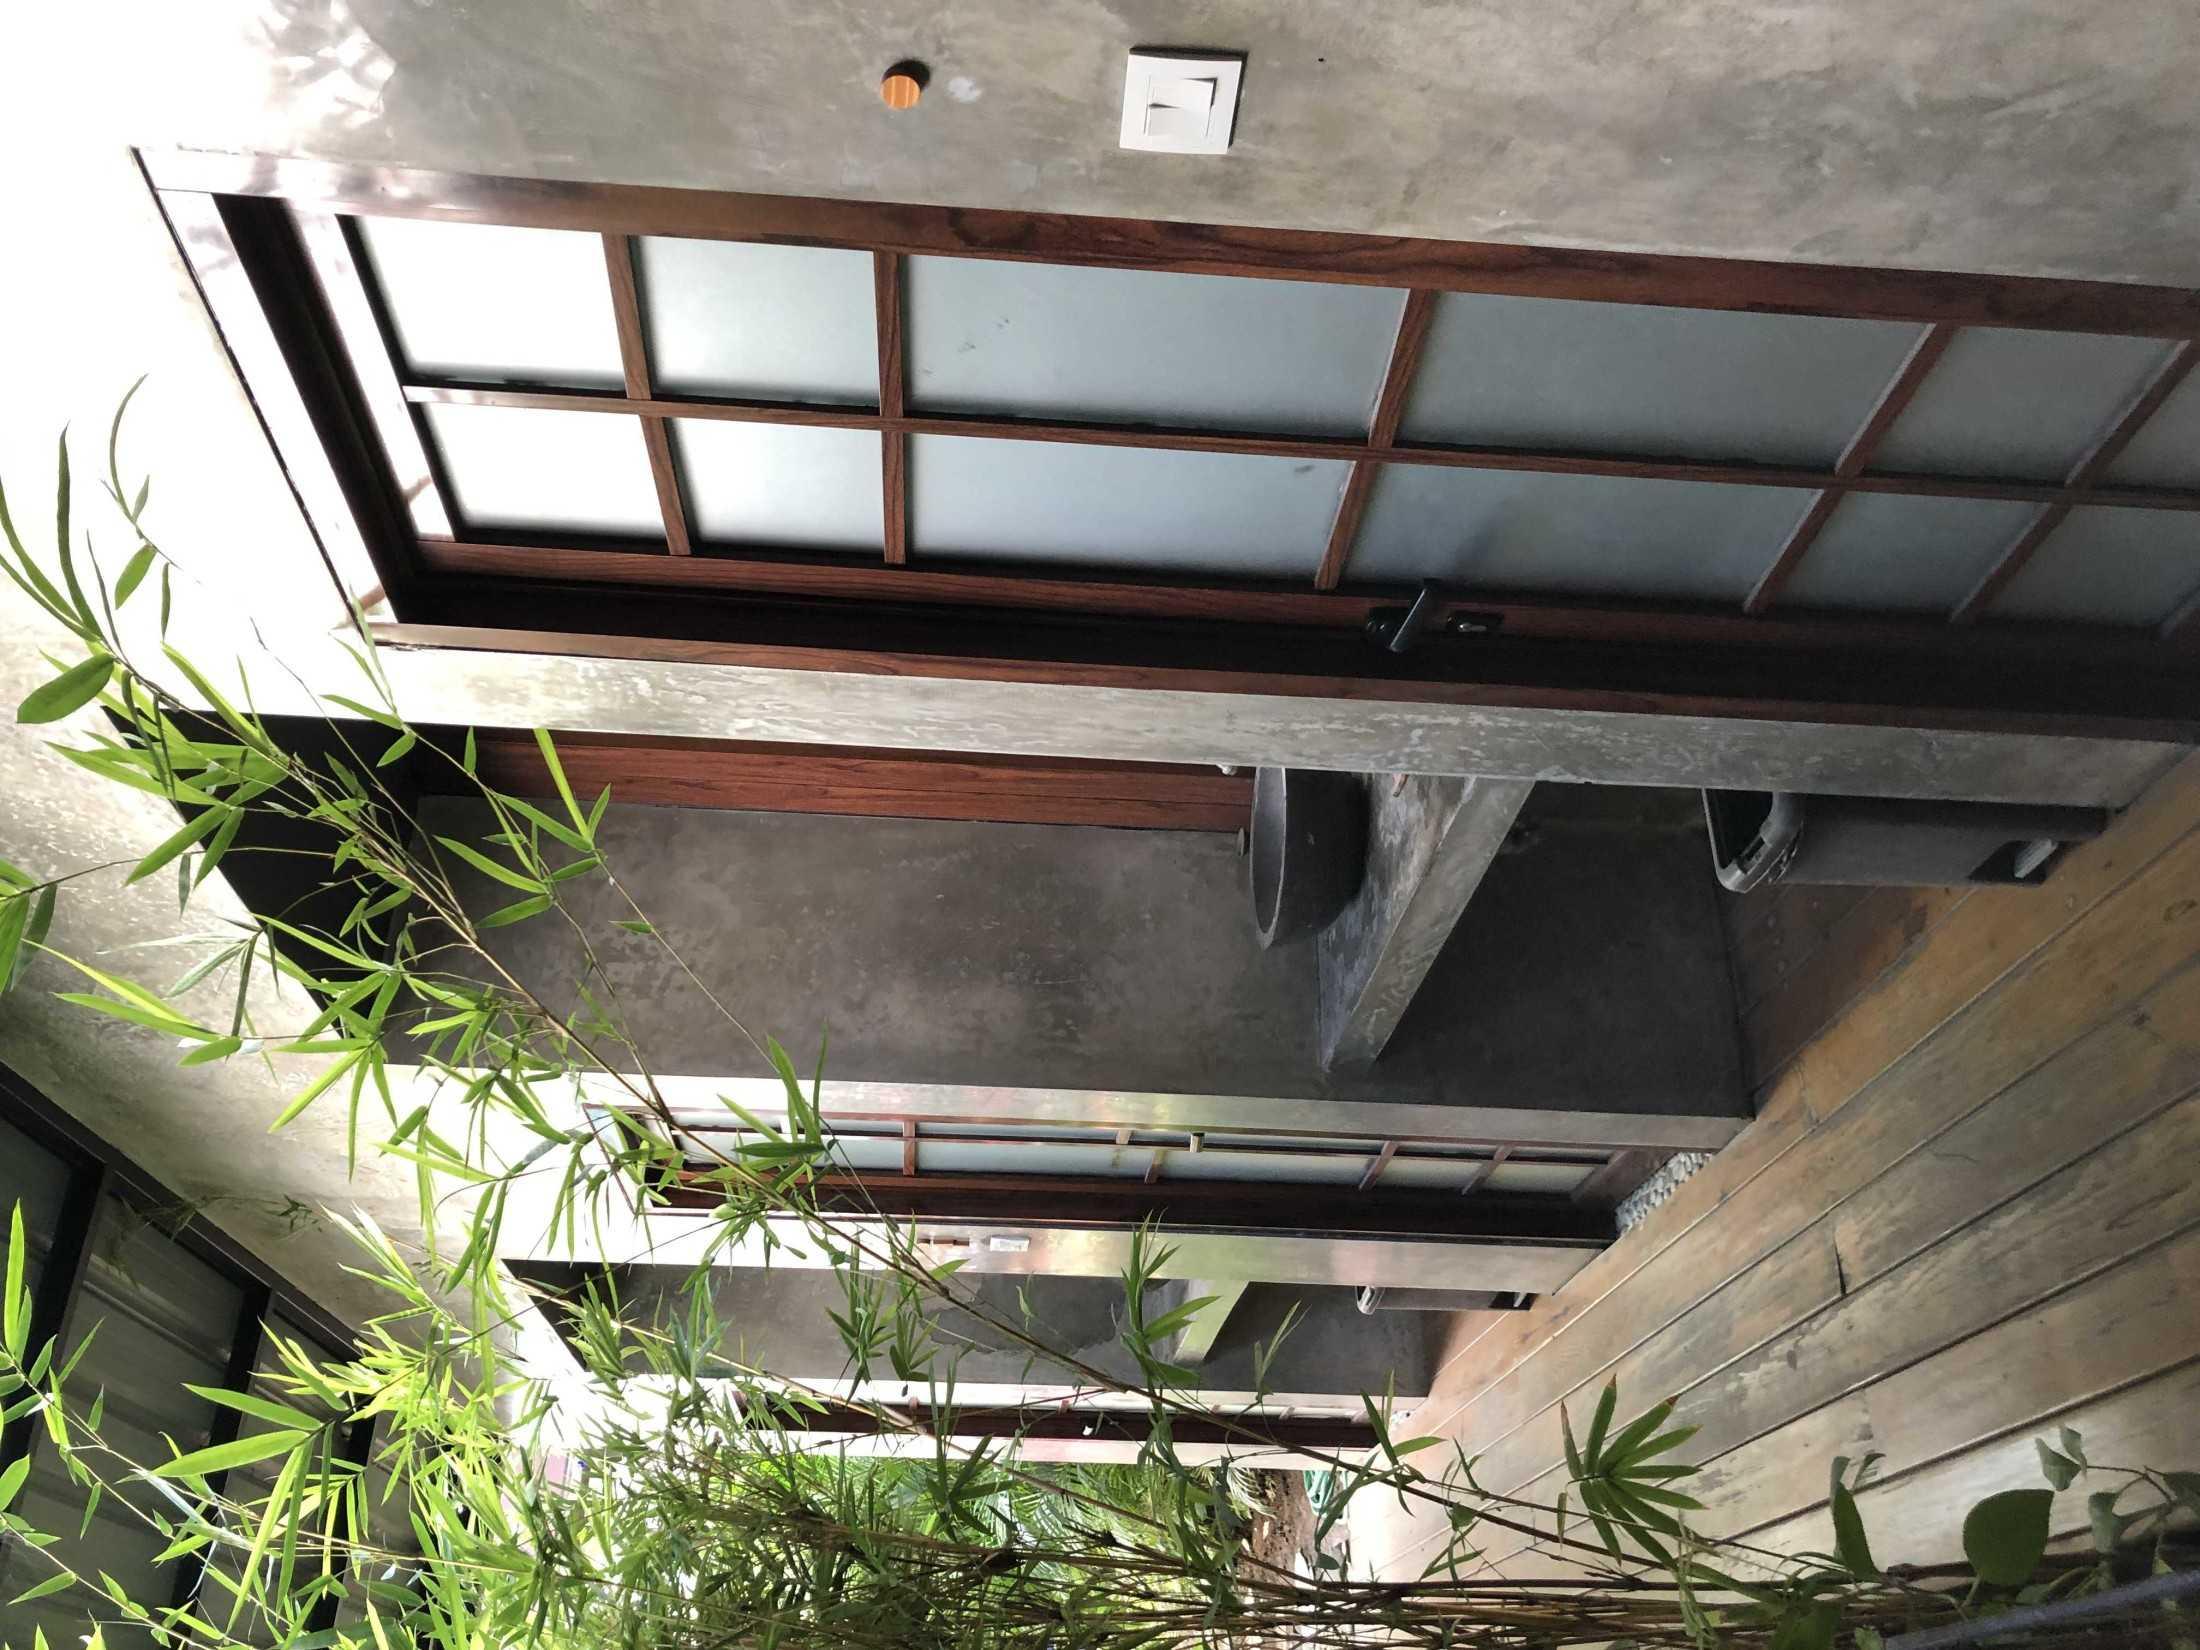 Seed Studio Moringa Bali, Indonesia Bali, Indonesia Seed-Studio-Moringa  115808